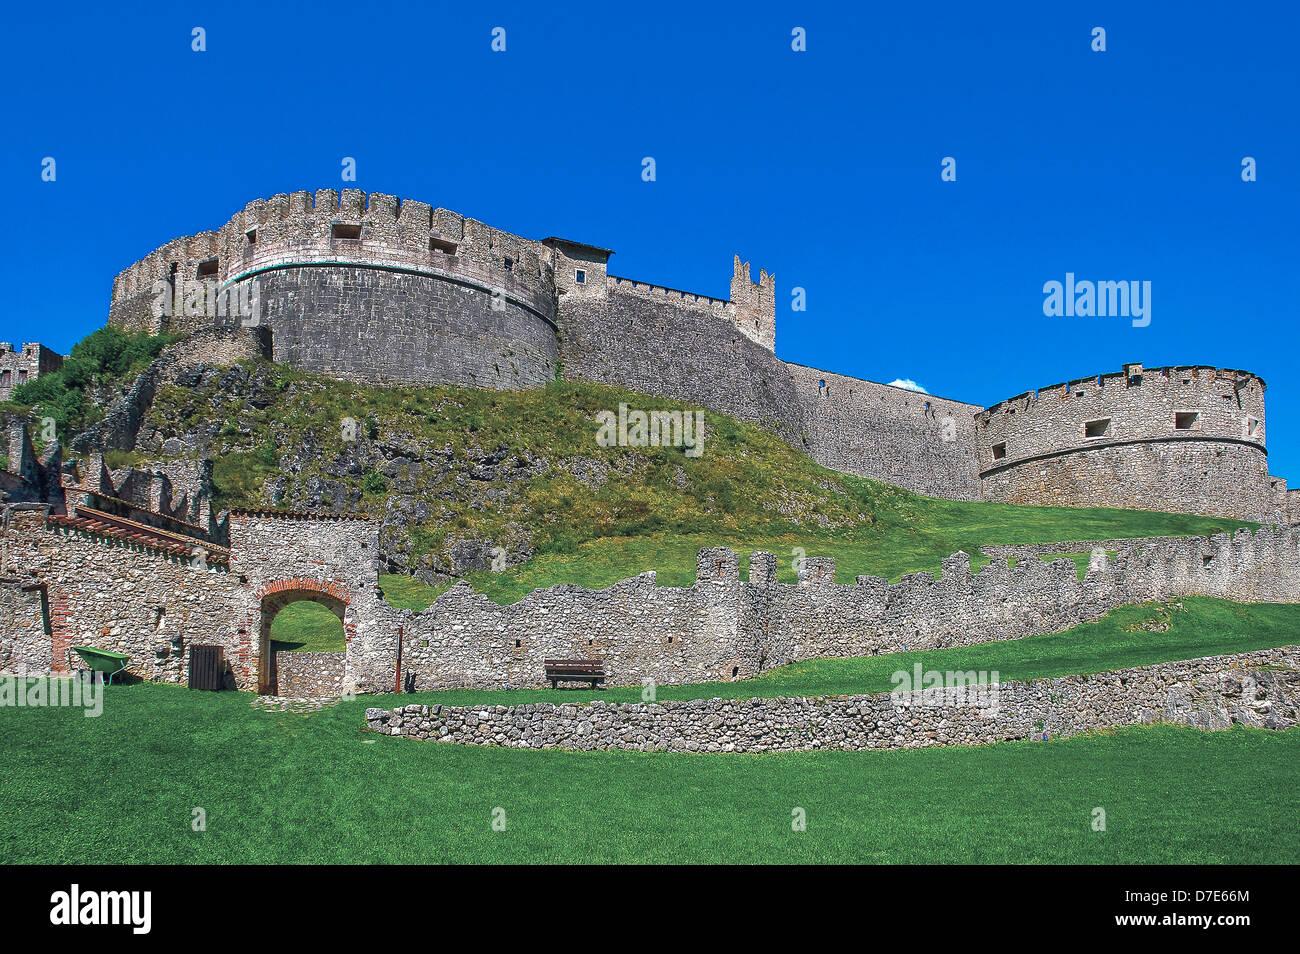 Europe Italy Trentino Alto Adige Besenello Castel Beseno - Stock Image